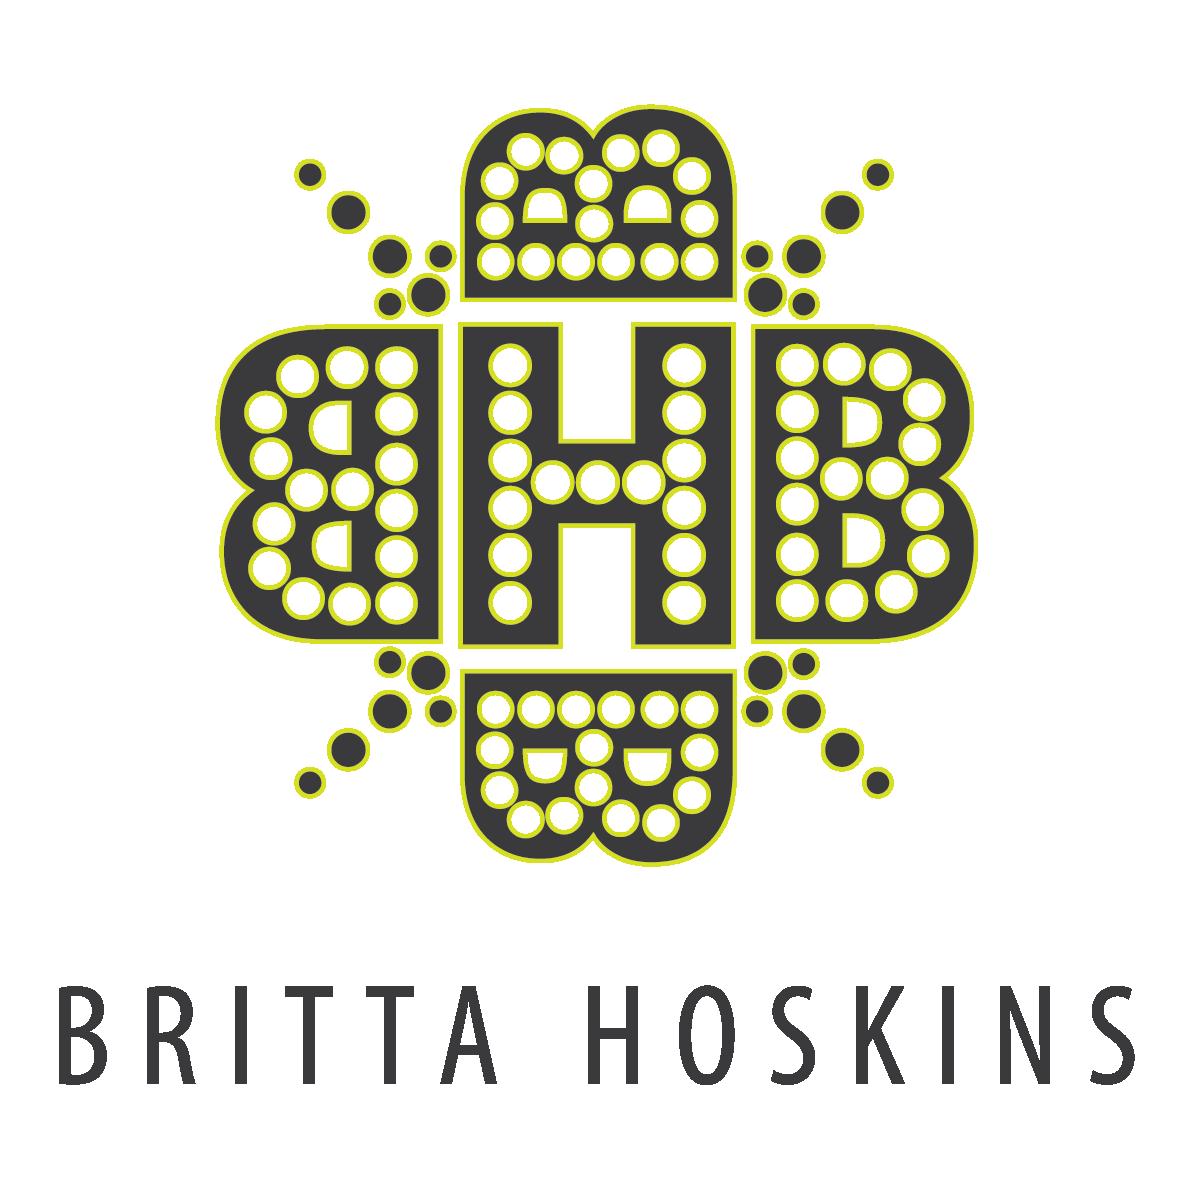 Britta Hoskins